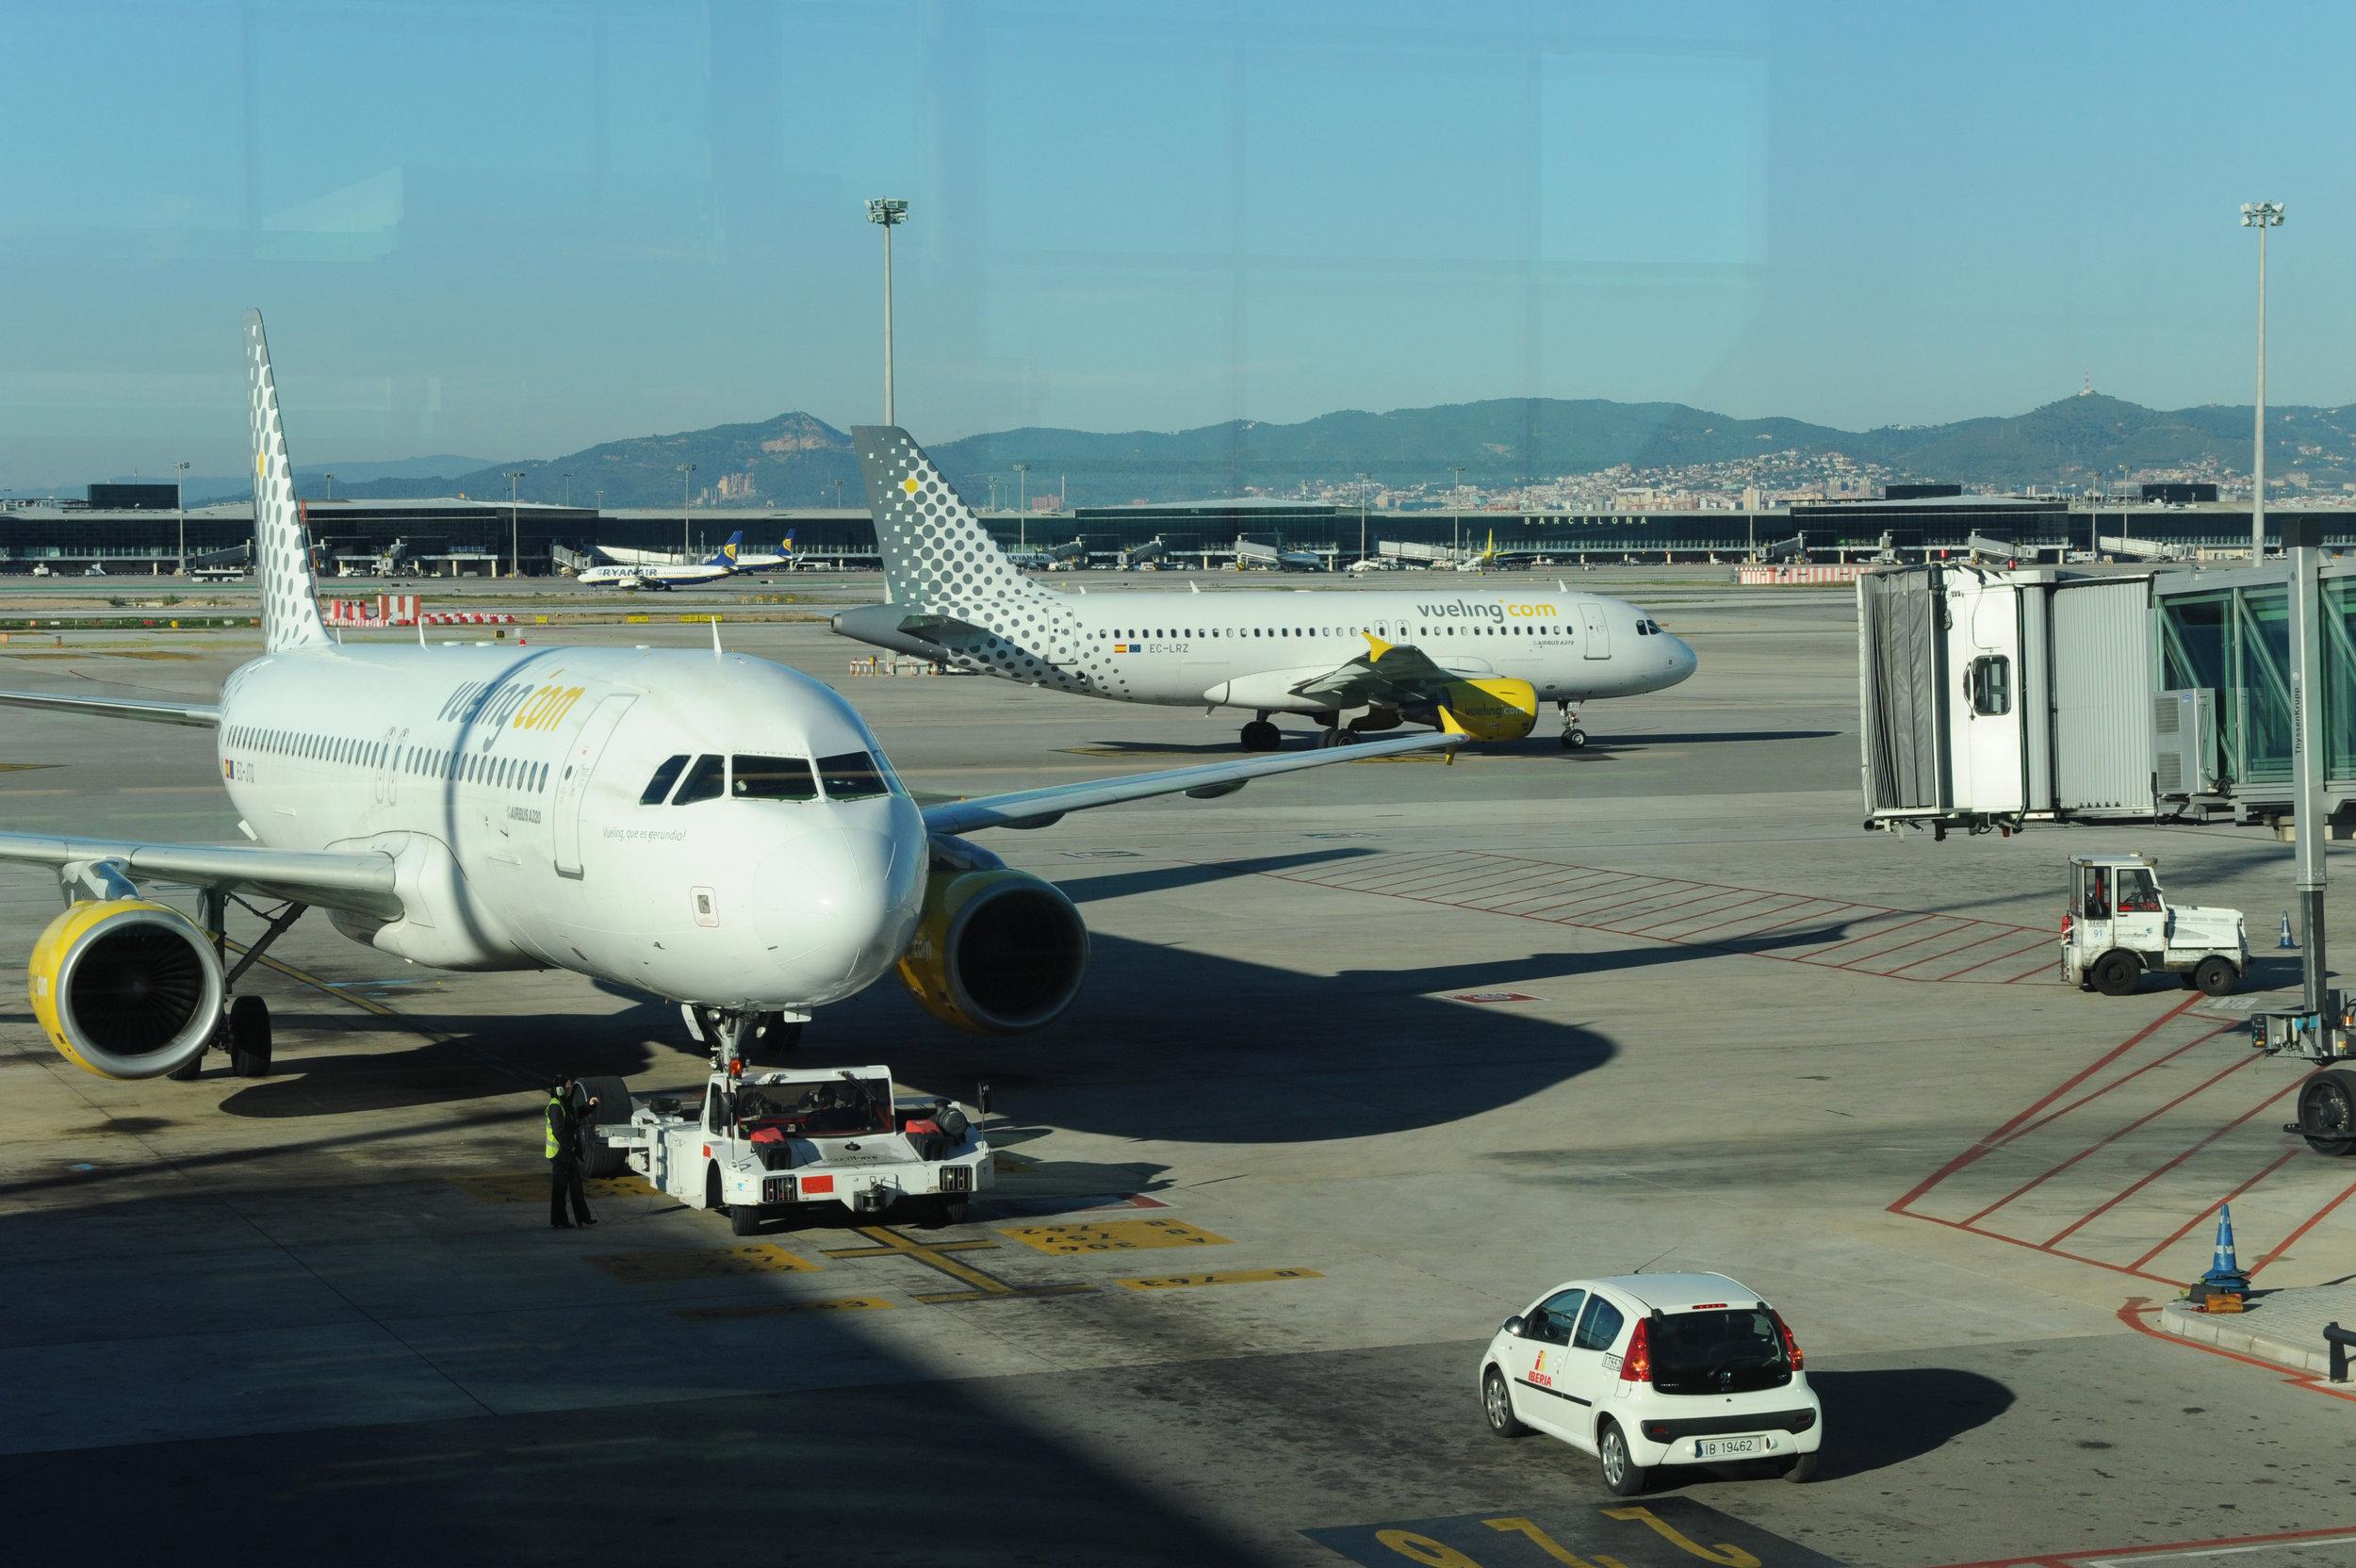 Barcelona, lentokenttä, lentokone